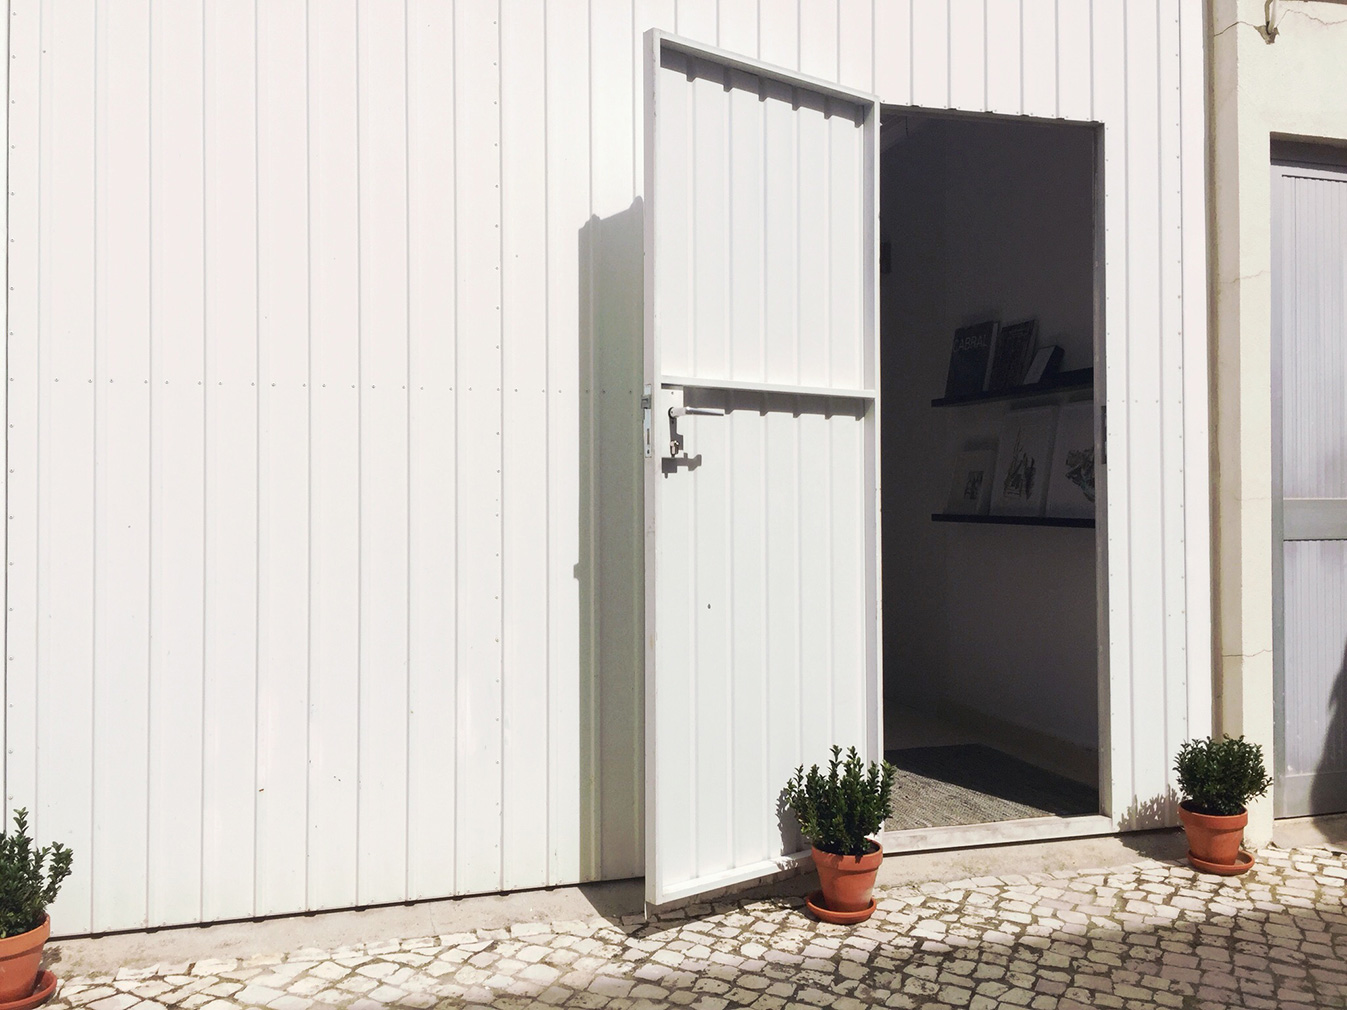 Ibirapi gallery in Lisbon